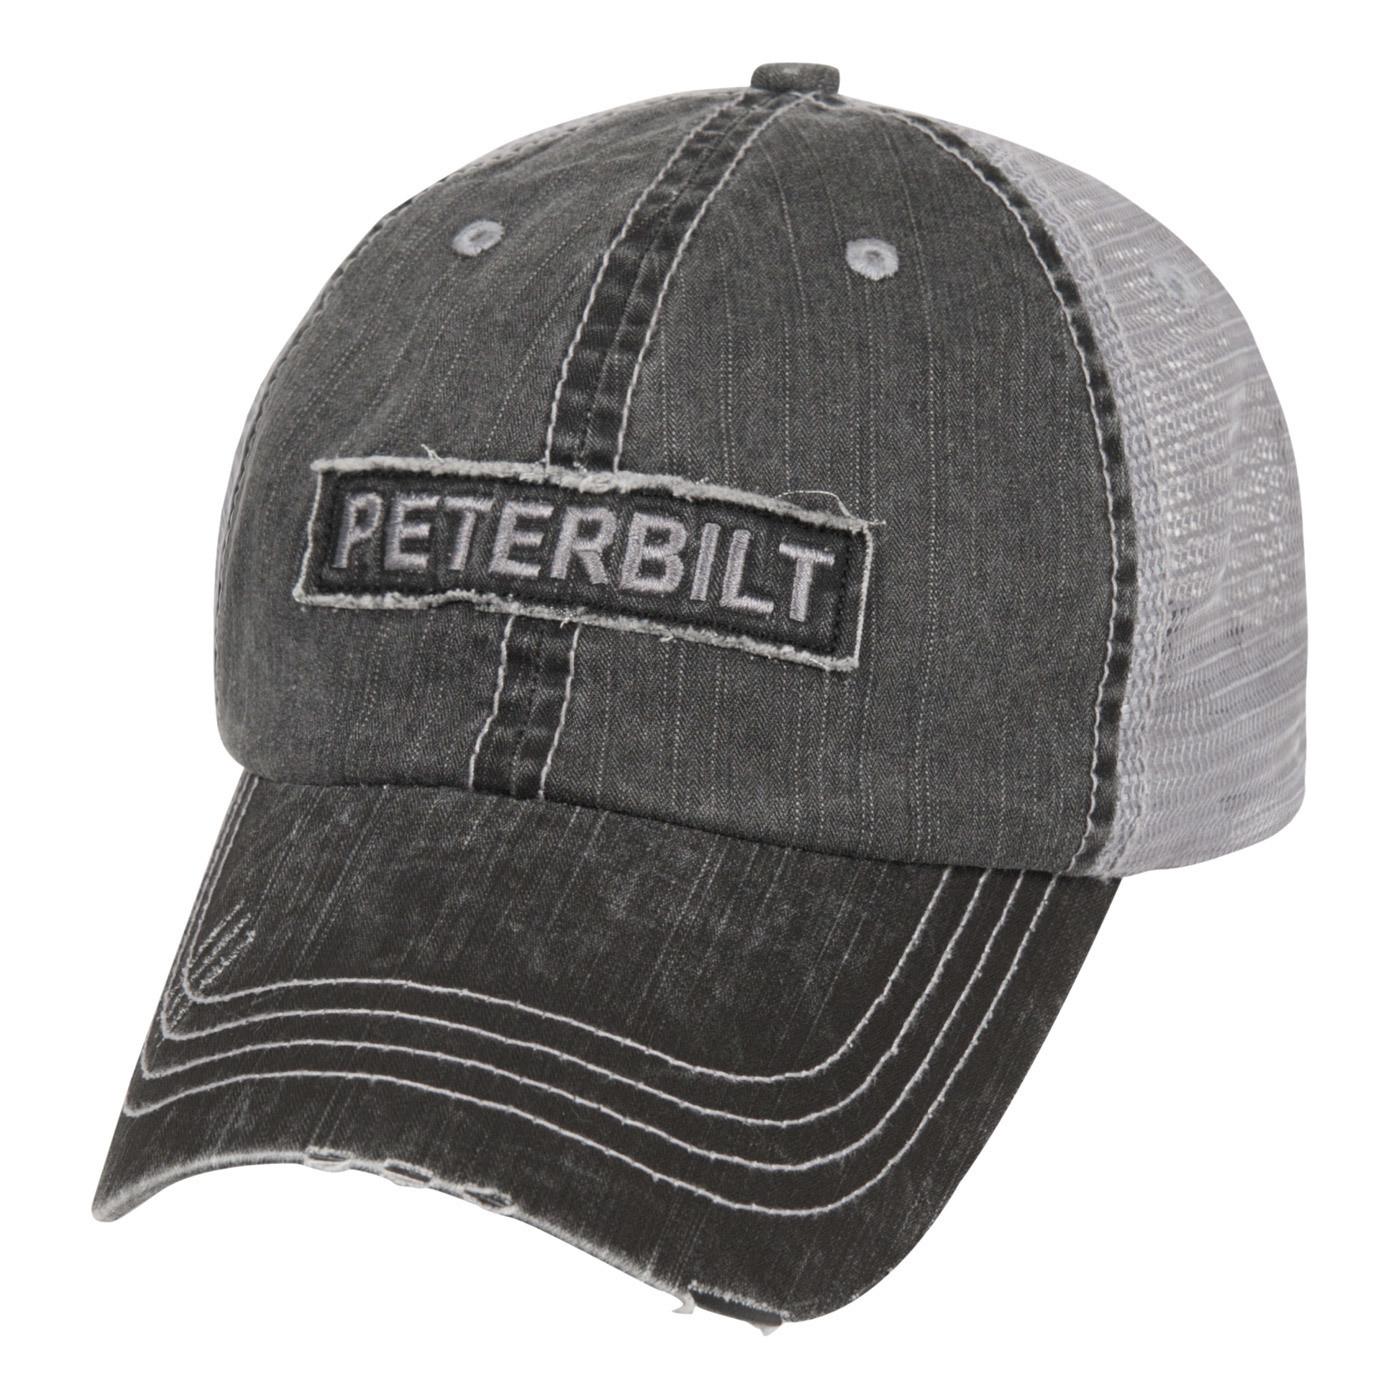 Peterbilt Raw Edge Patch Cap